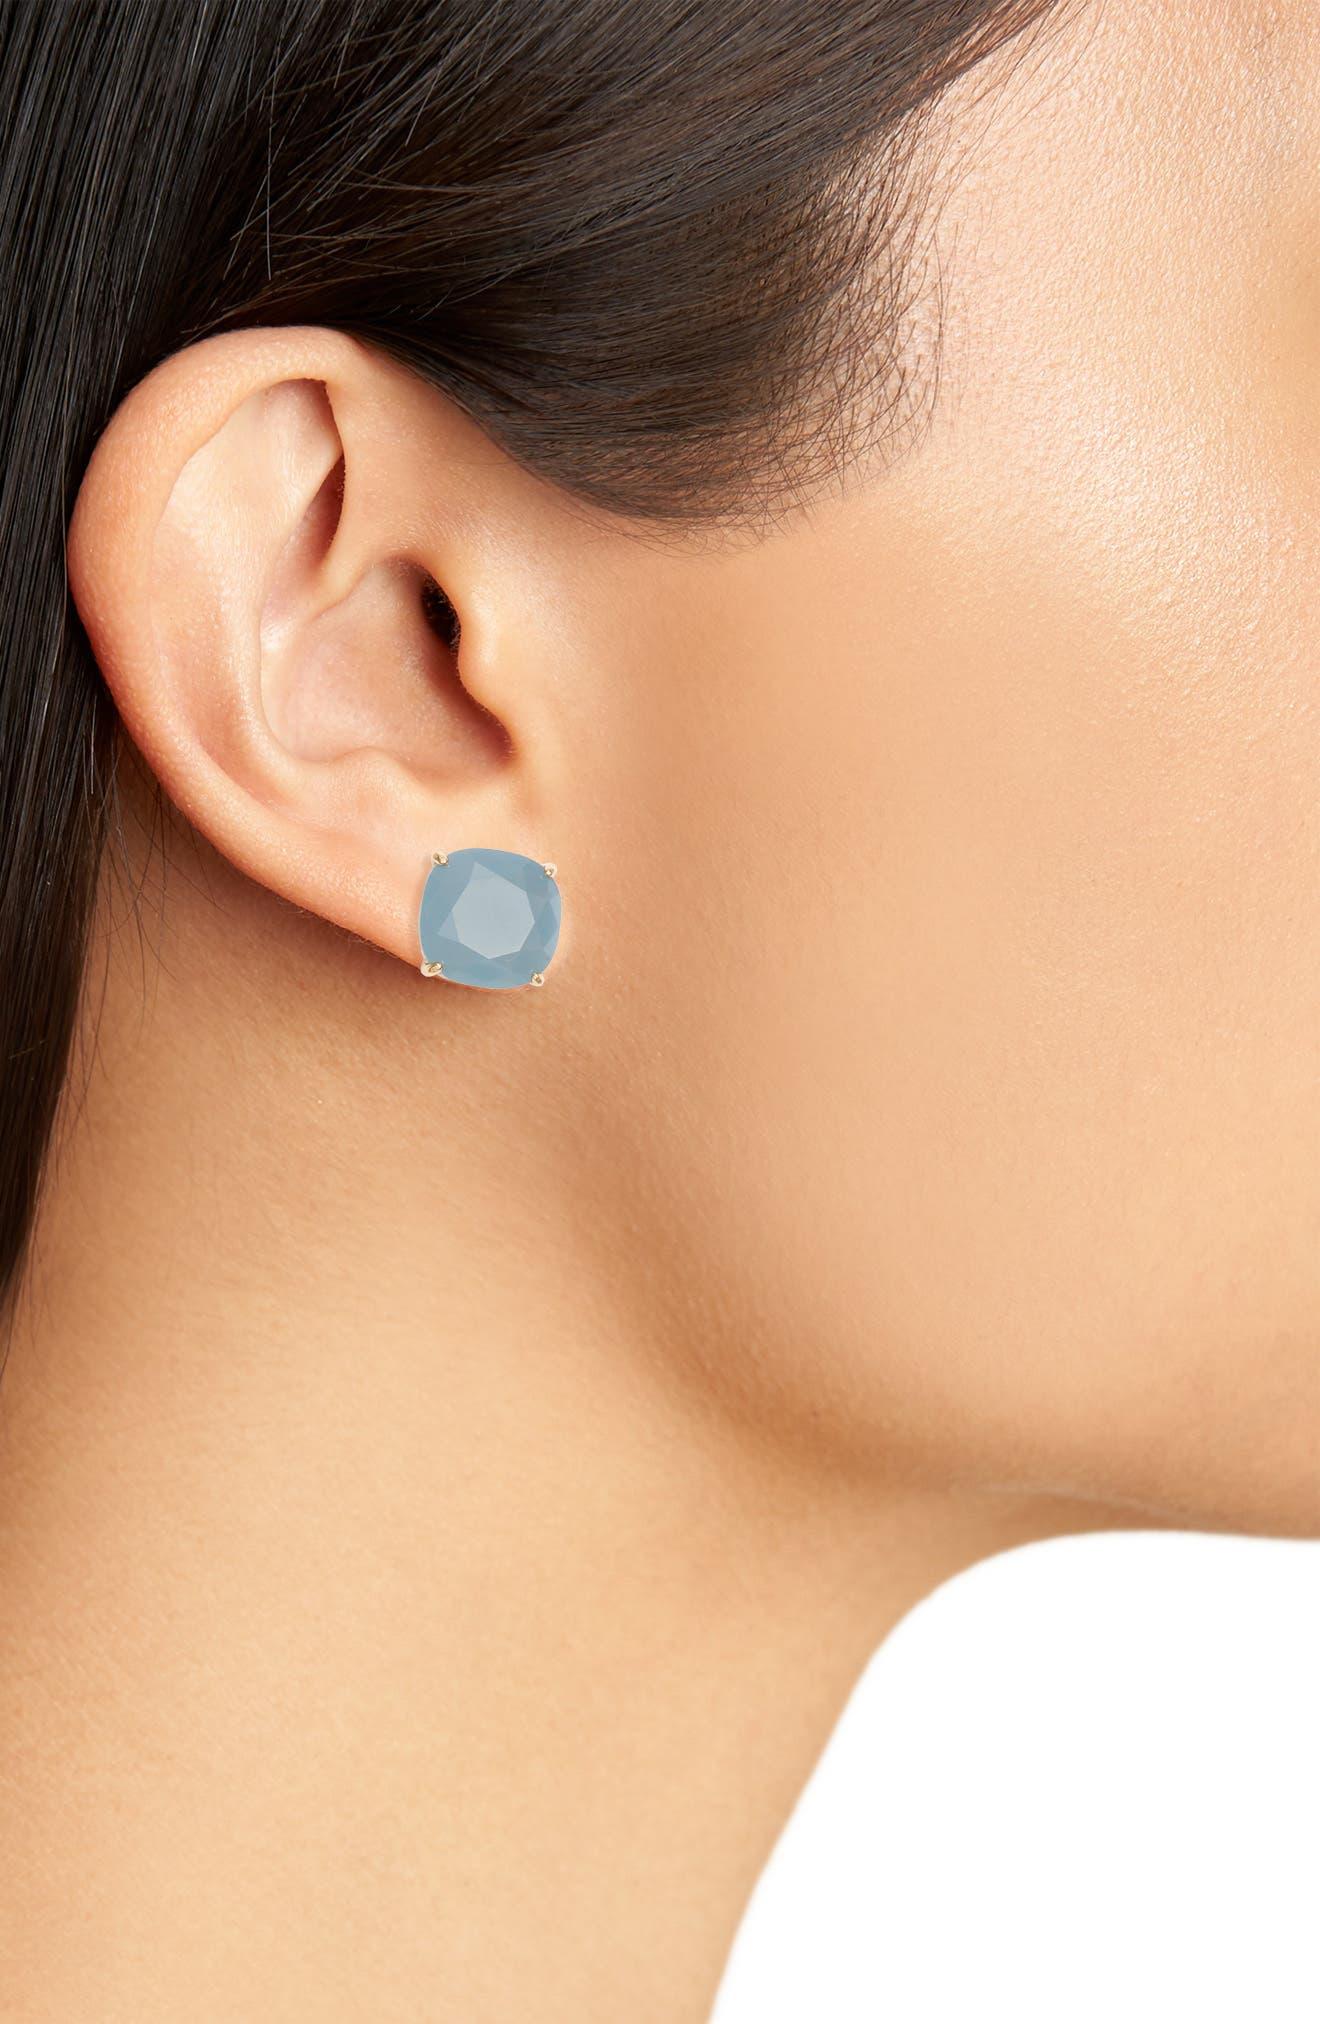 KATE SPADE NEW YORK,                             small square stud earrings,                             Alternate thumbnail 2, color,                             SERENE BLUE